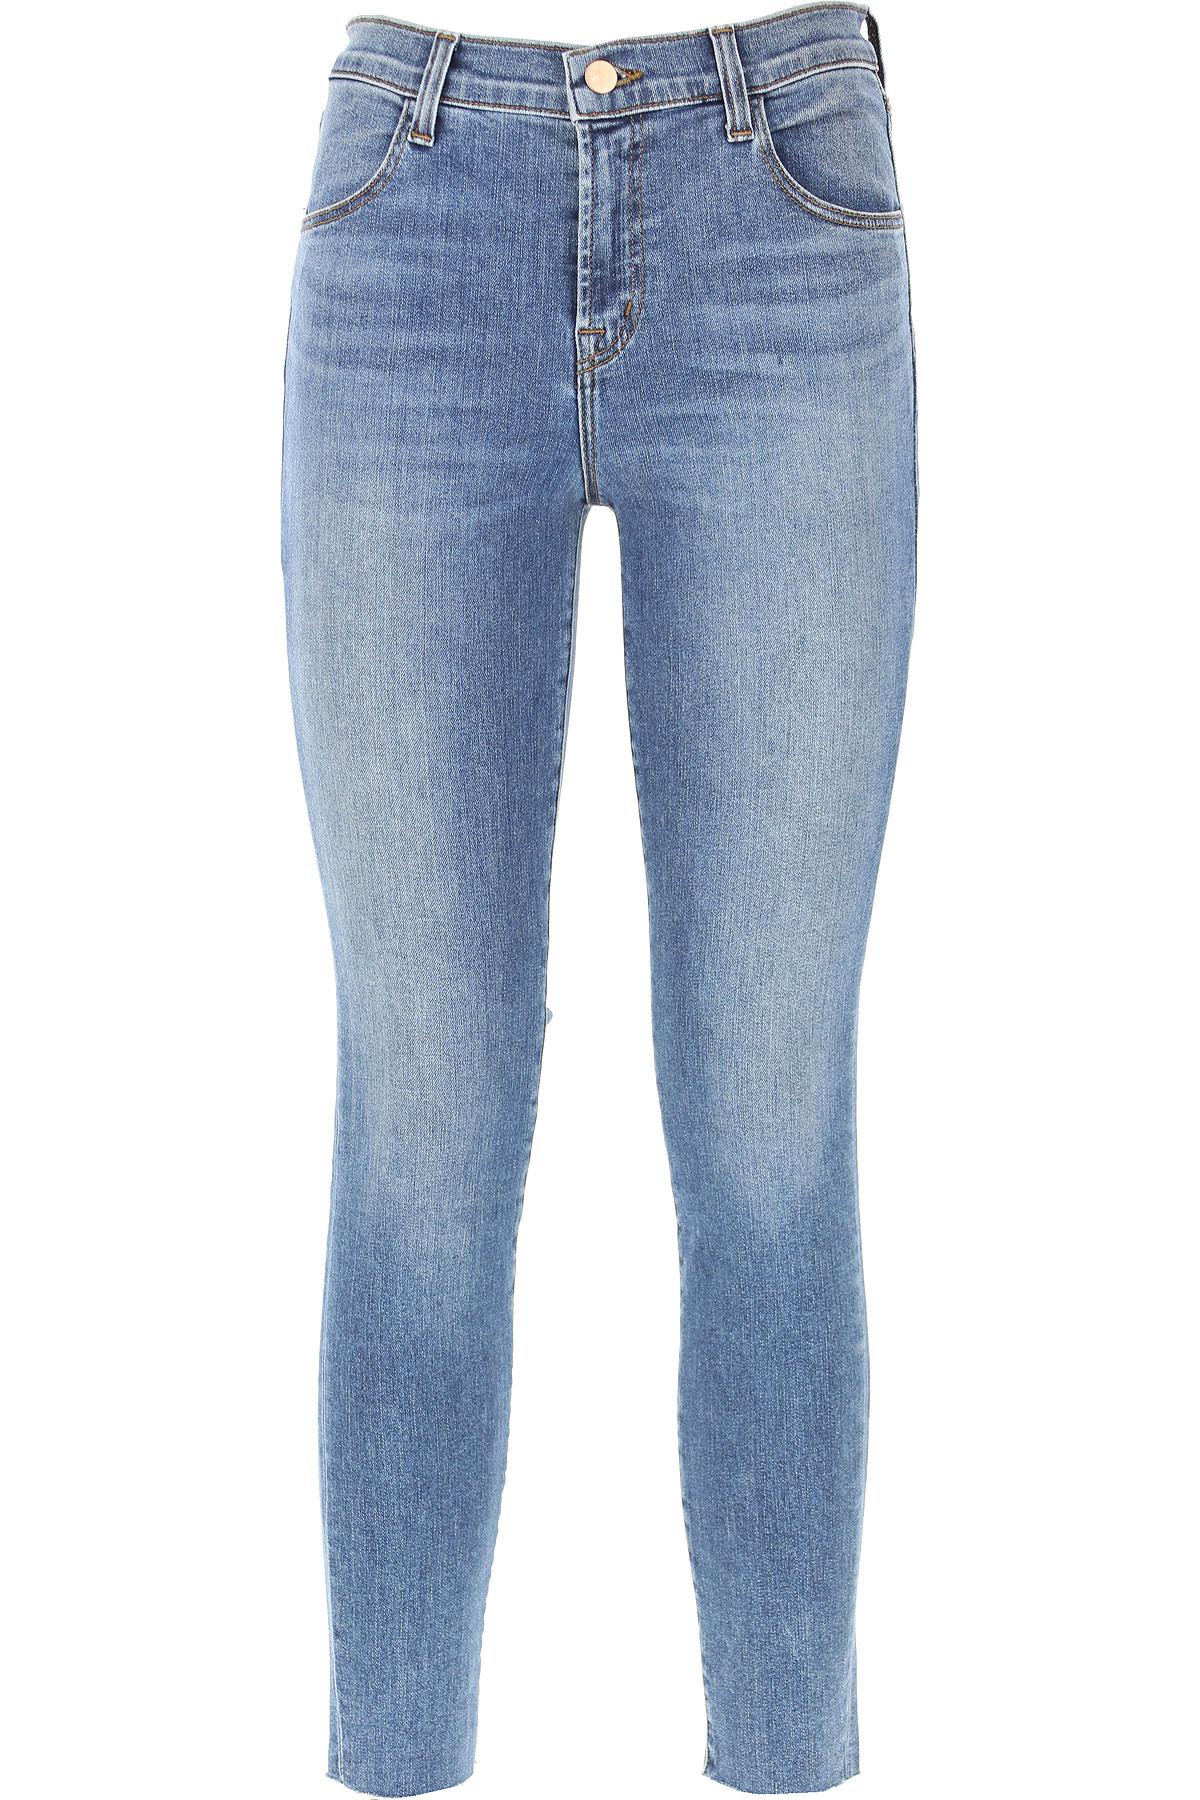 J Brand Jeans On Sale, Denim, Cotton, 2019, 25 27 28 29 30